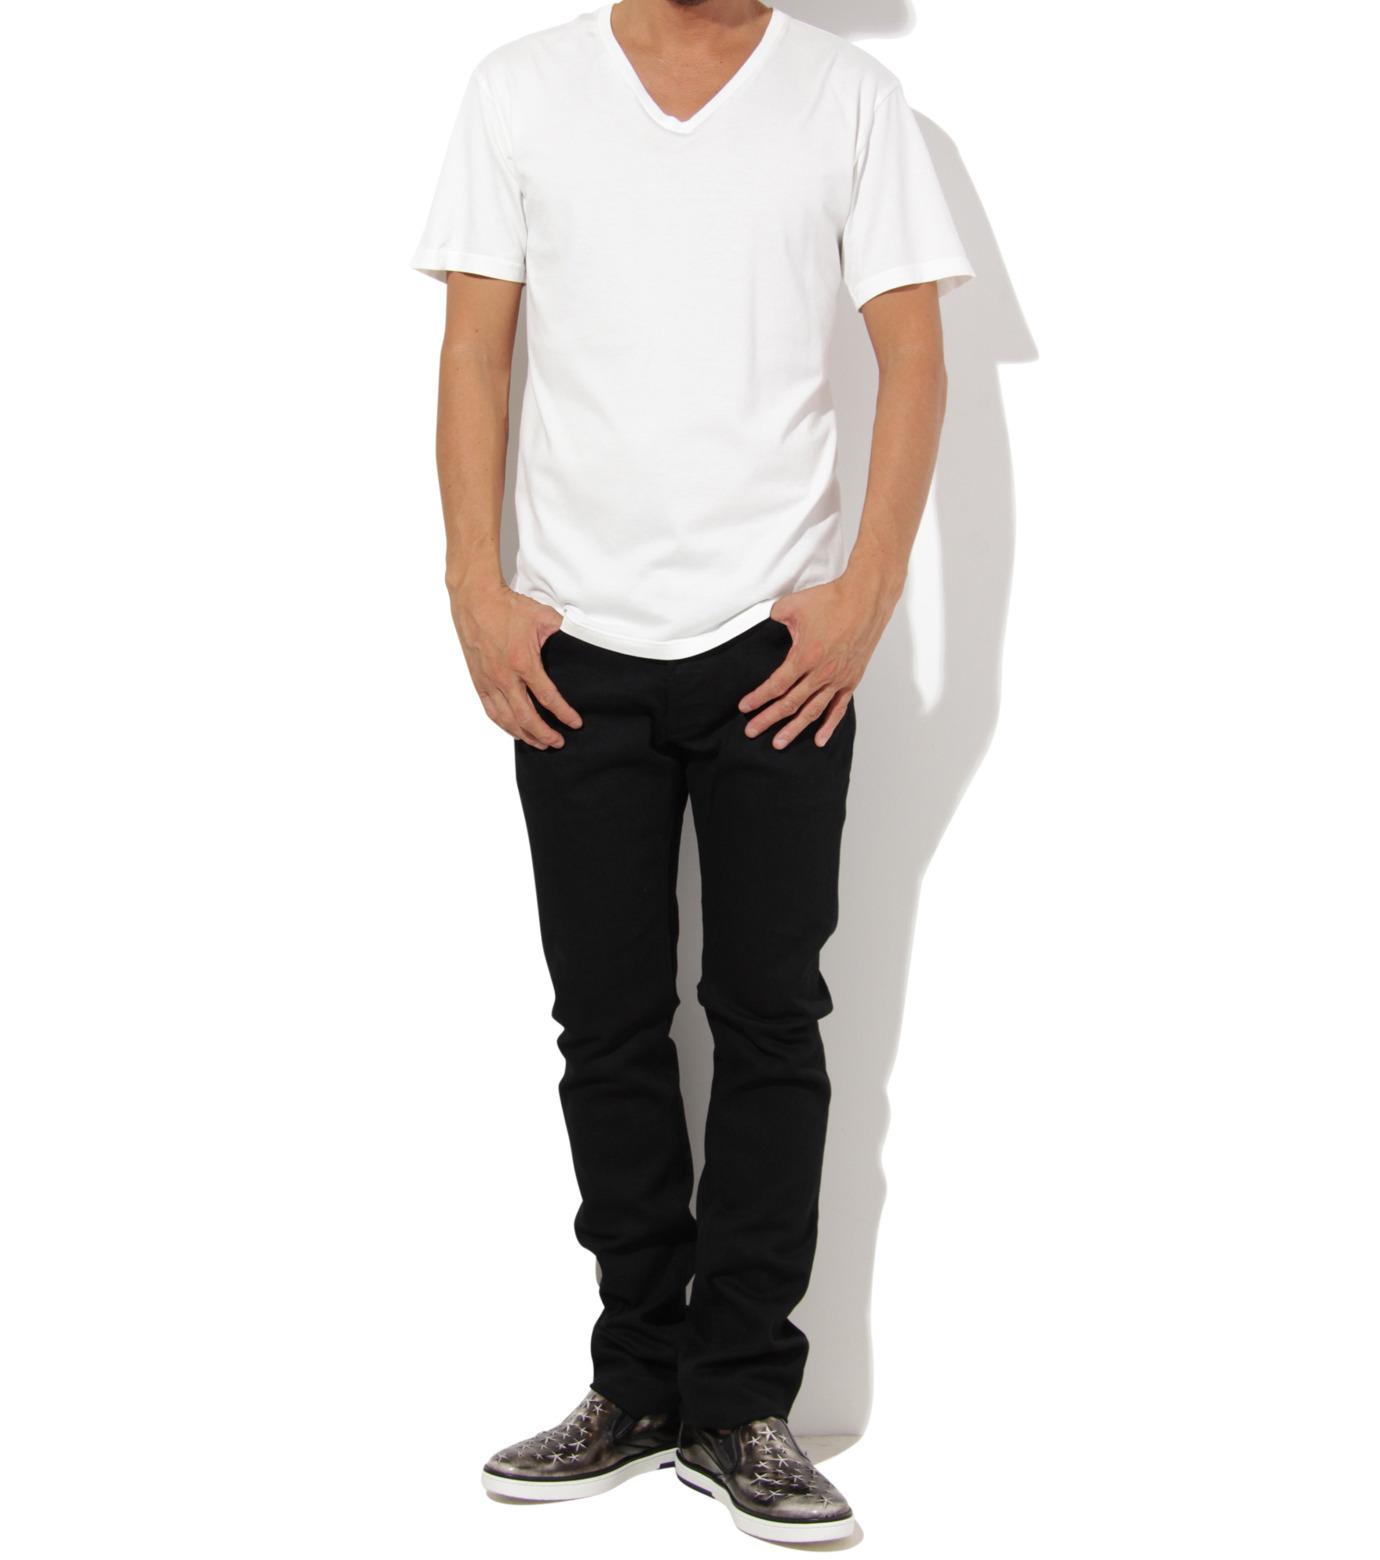 Heddie Lovu(エディー ルーヴ)のV NECK 【MACHO】-WHITE(カットソー/cut and sewn)-ST-M2-00-14A 拡大詳細画像3